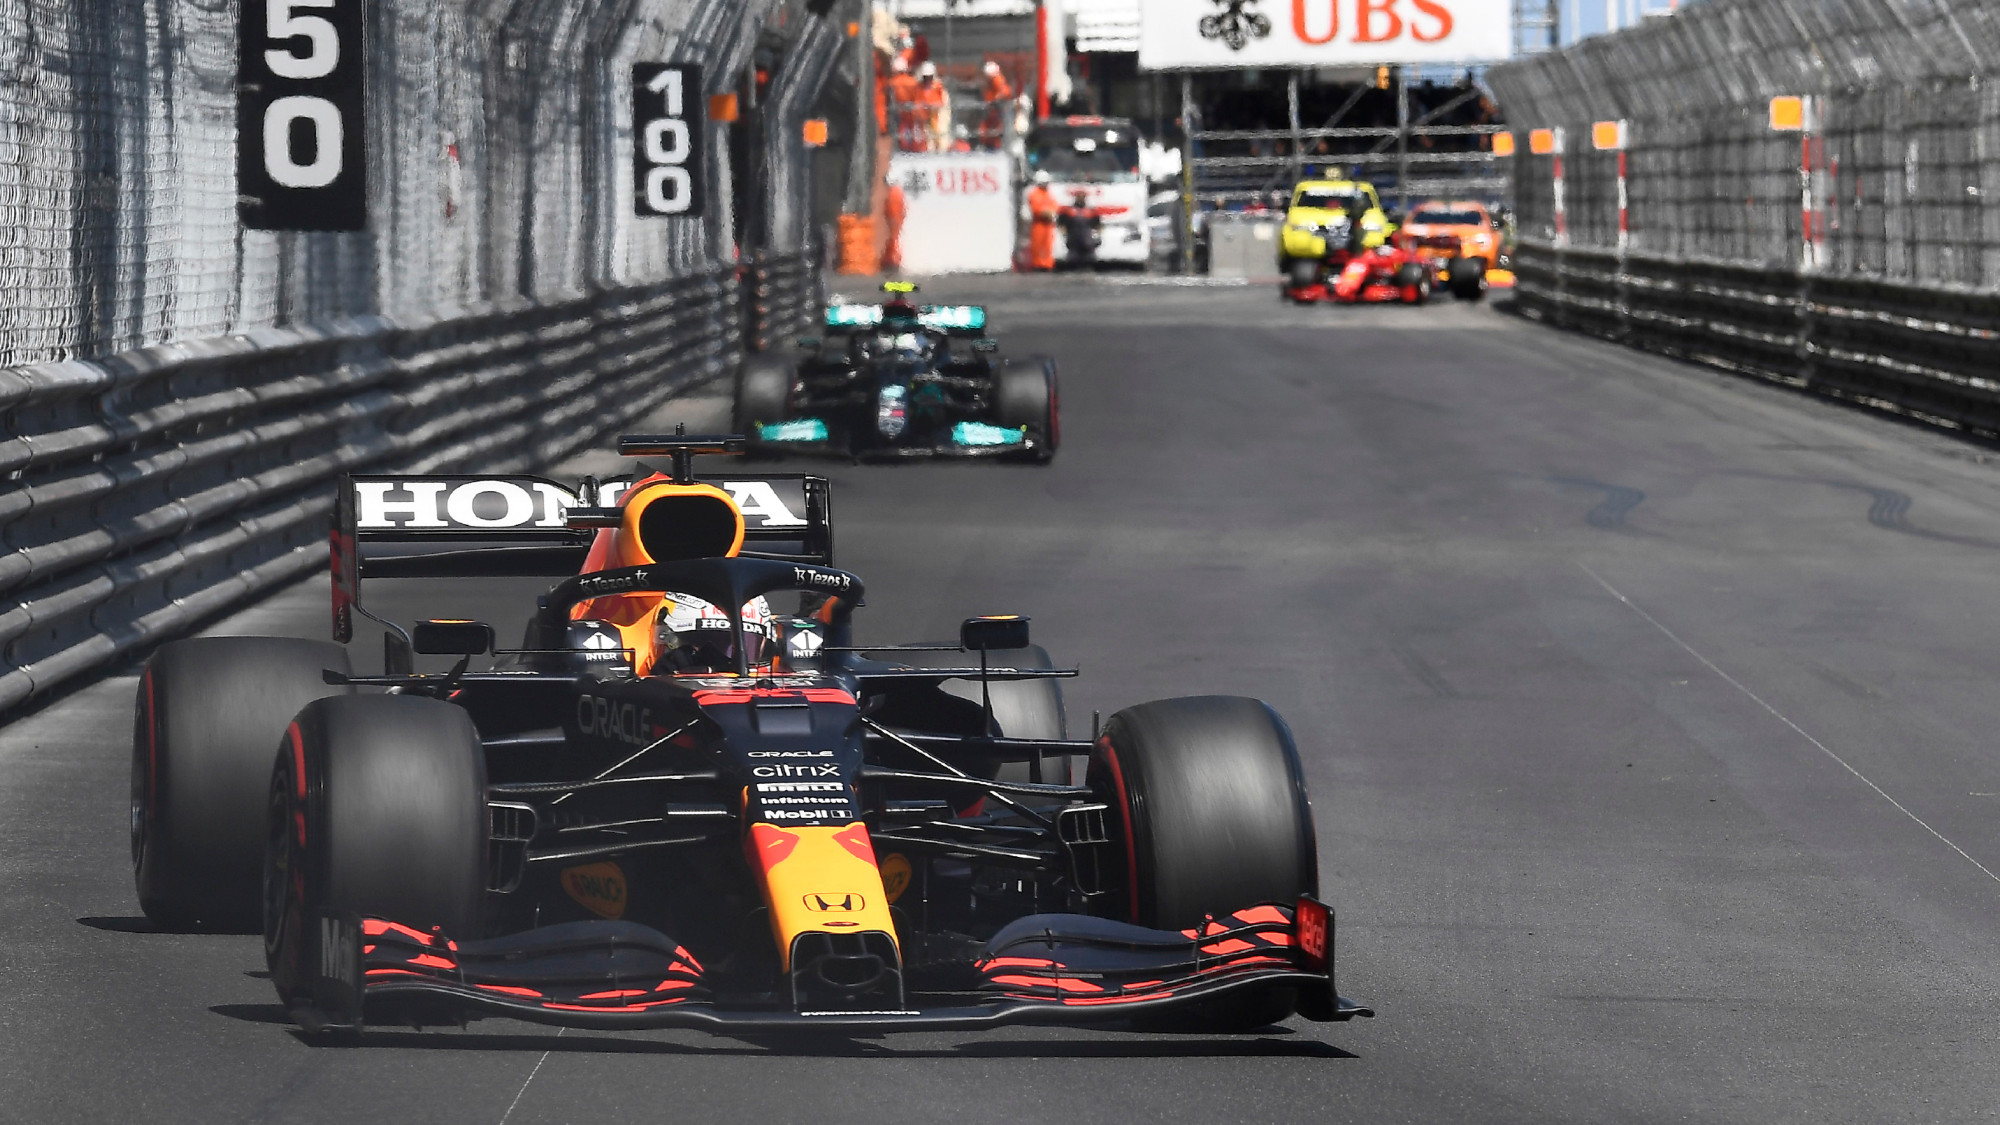 Max Verstappen, 2021 Monaco GP